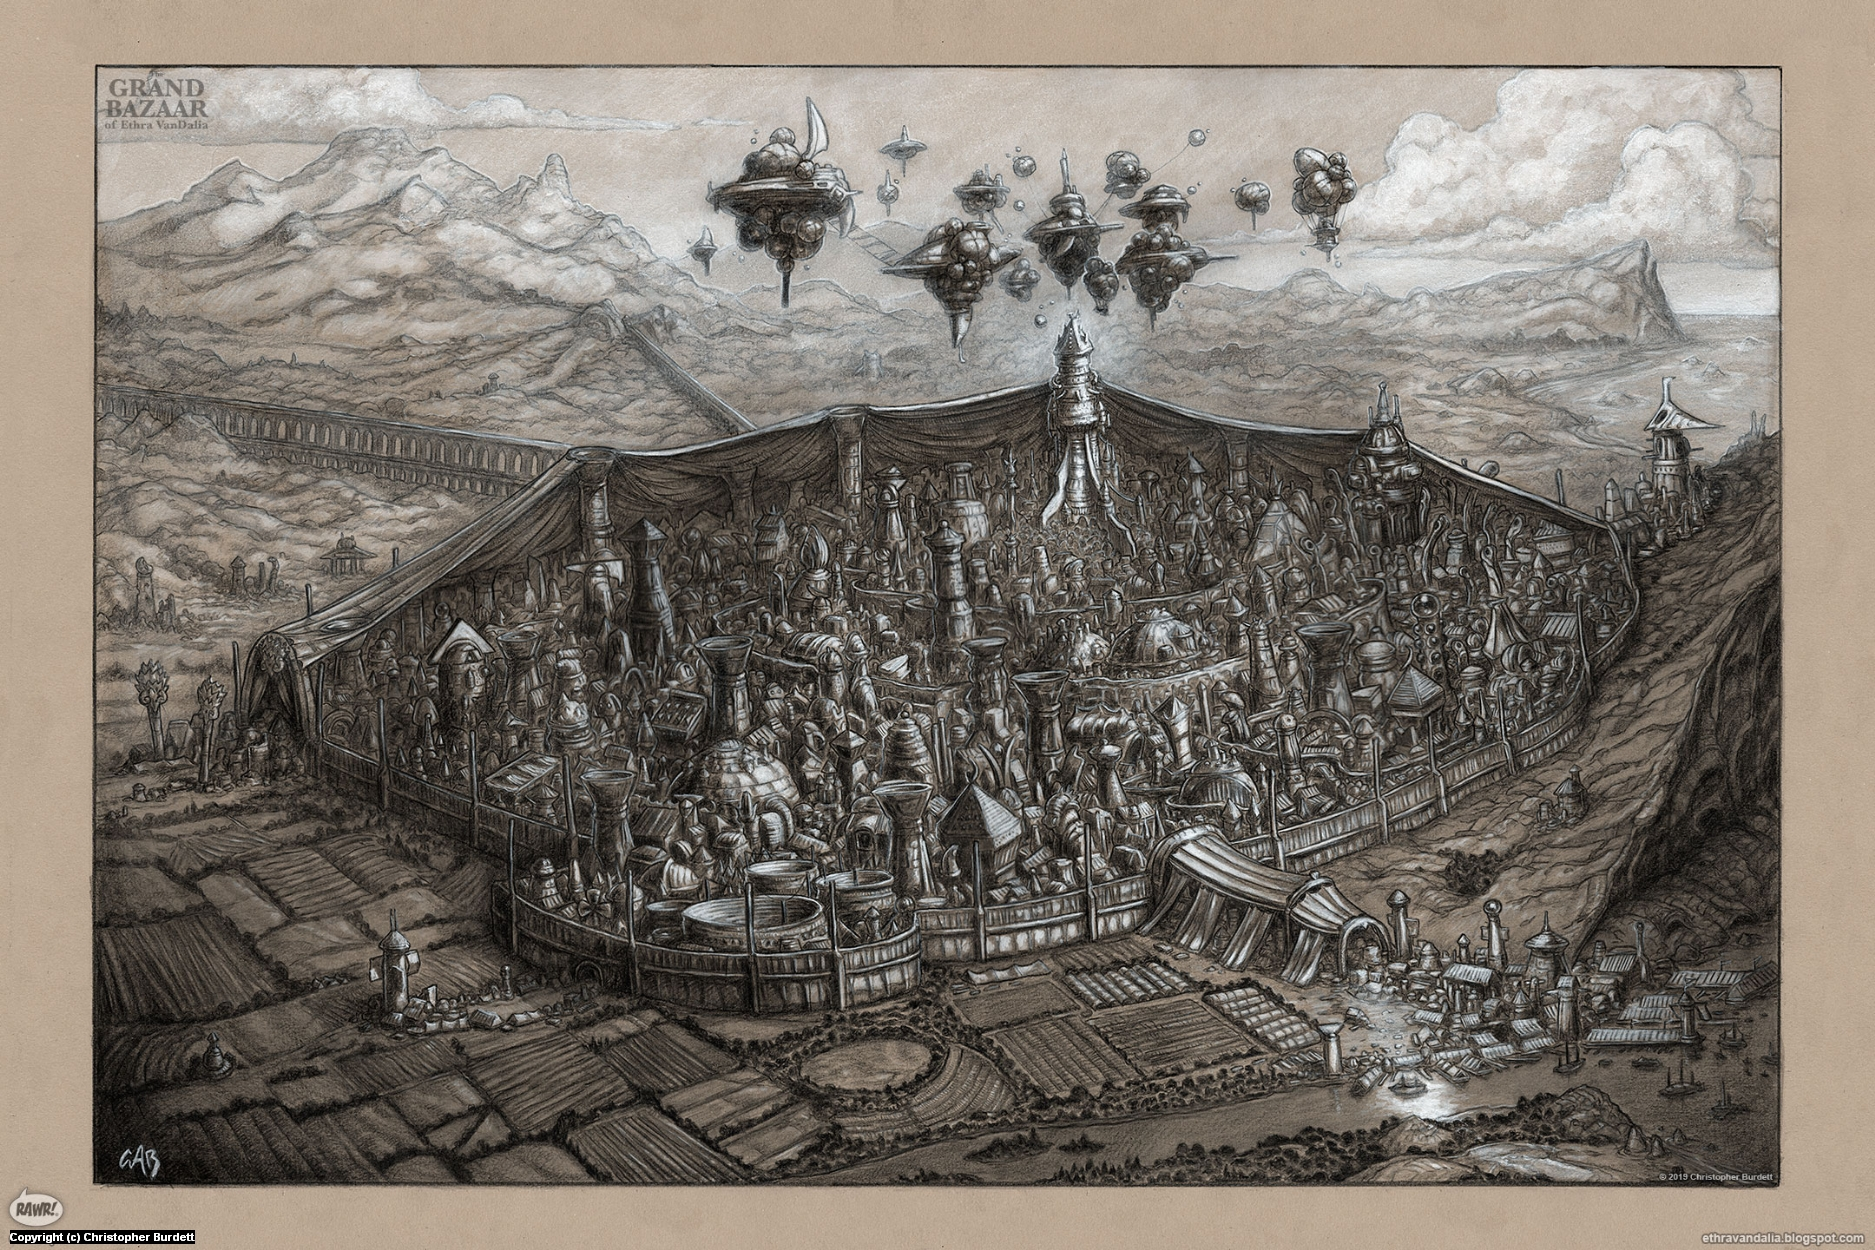 The Grand Map of the Bazaar of Ethra VanDalia Artwork by Christopher Burdett